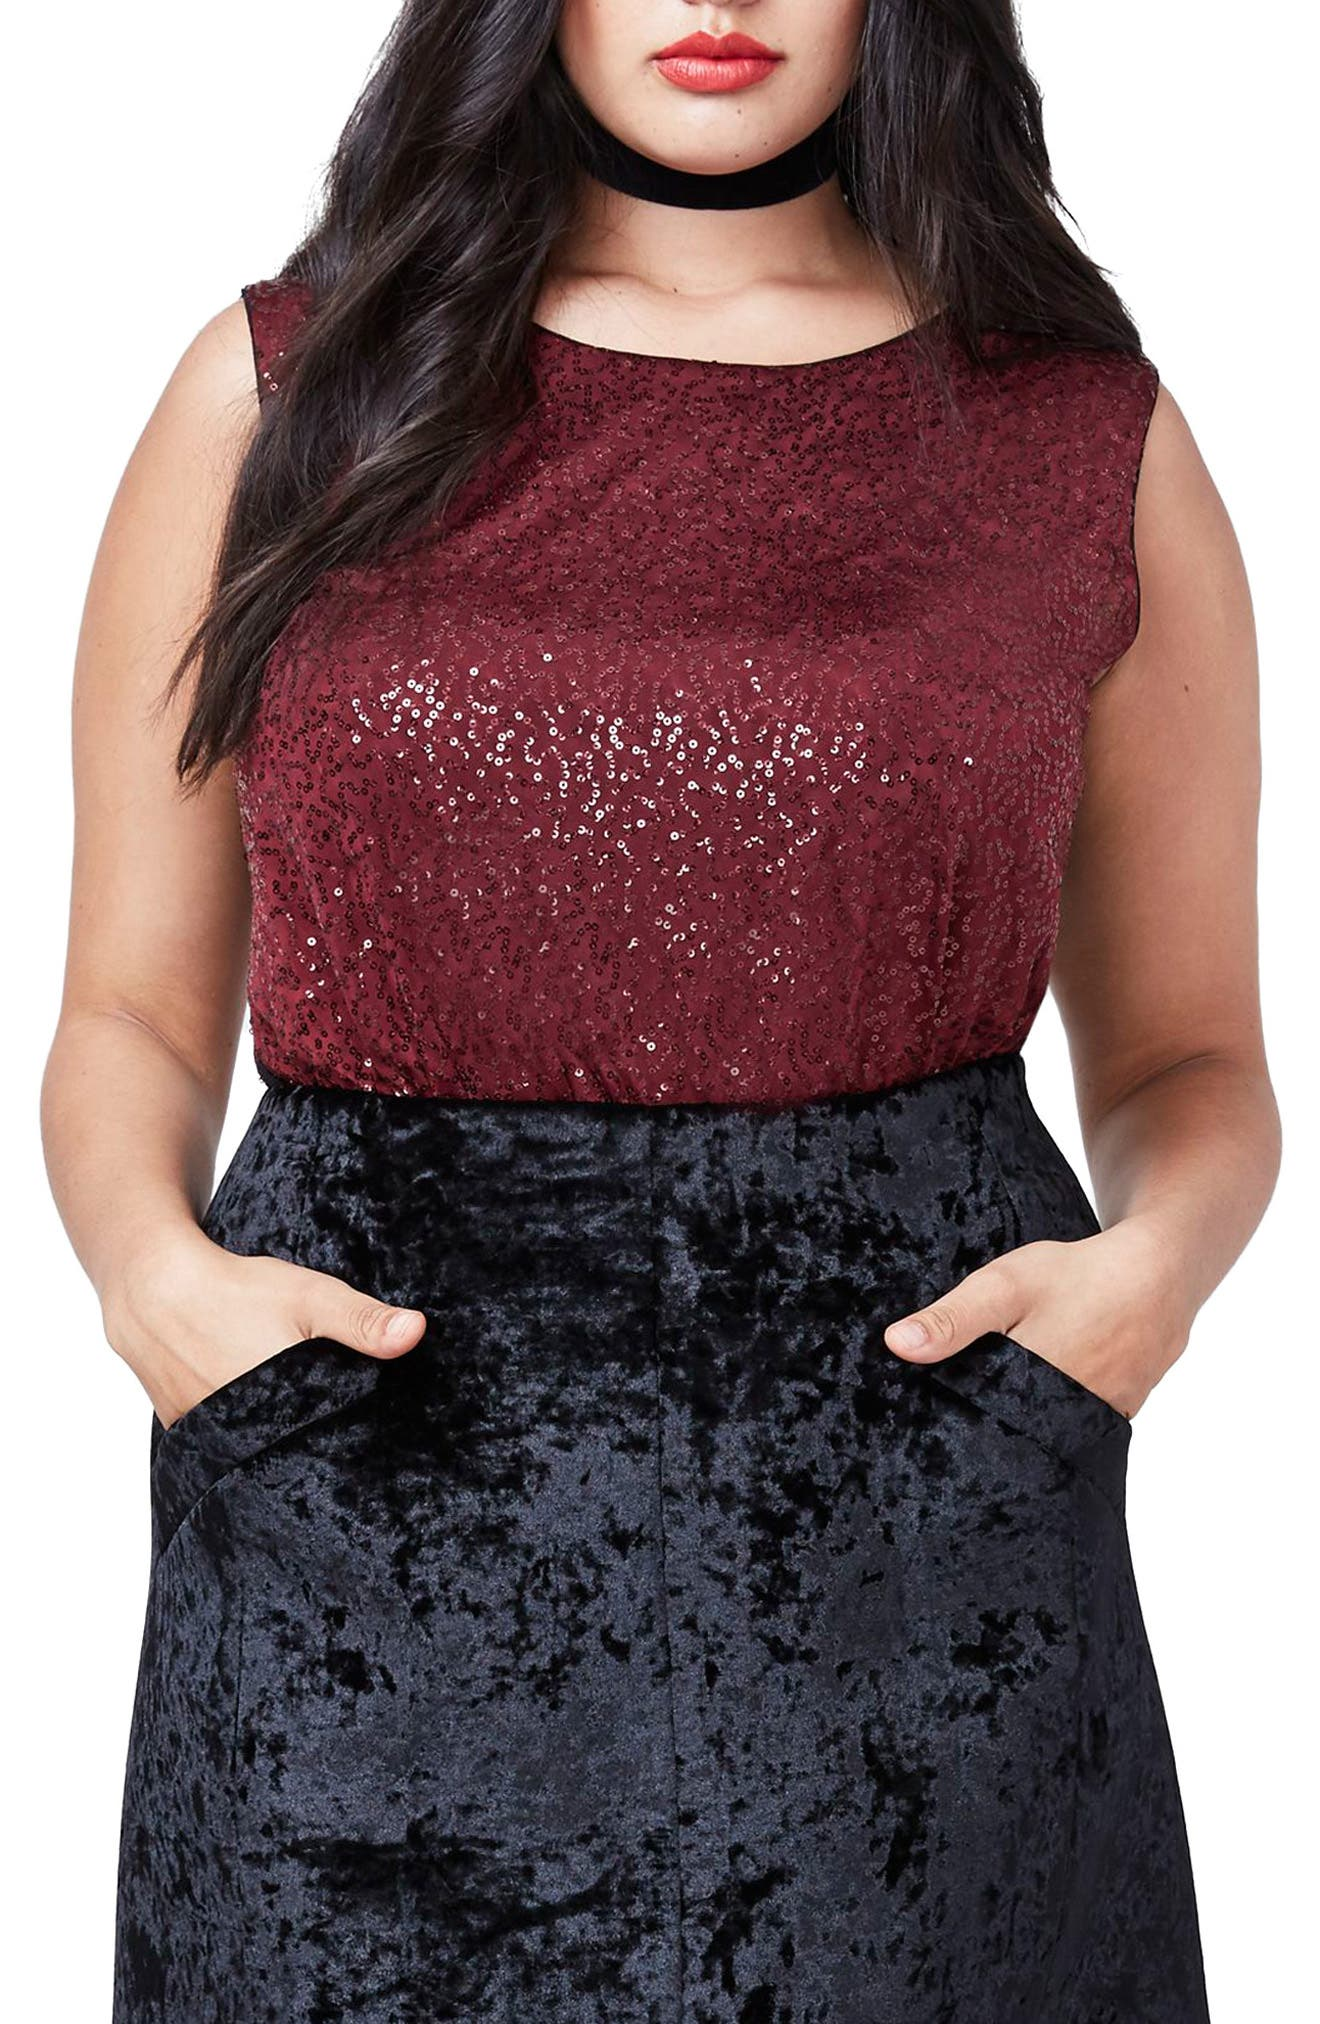 Alternate Image 1 Selected - RACHEL Rachel Roy Sequin Bodysuit (Plus Size)